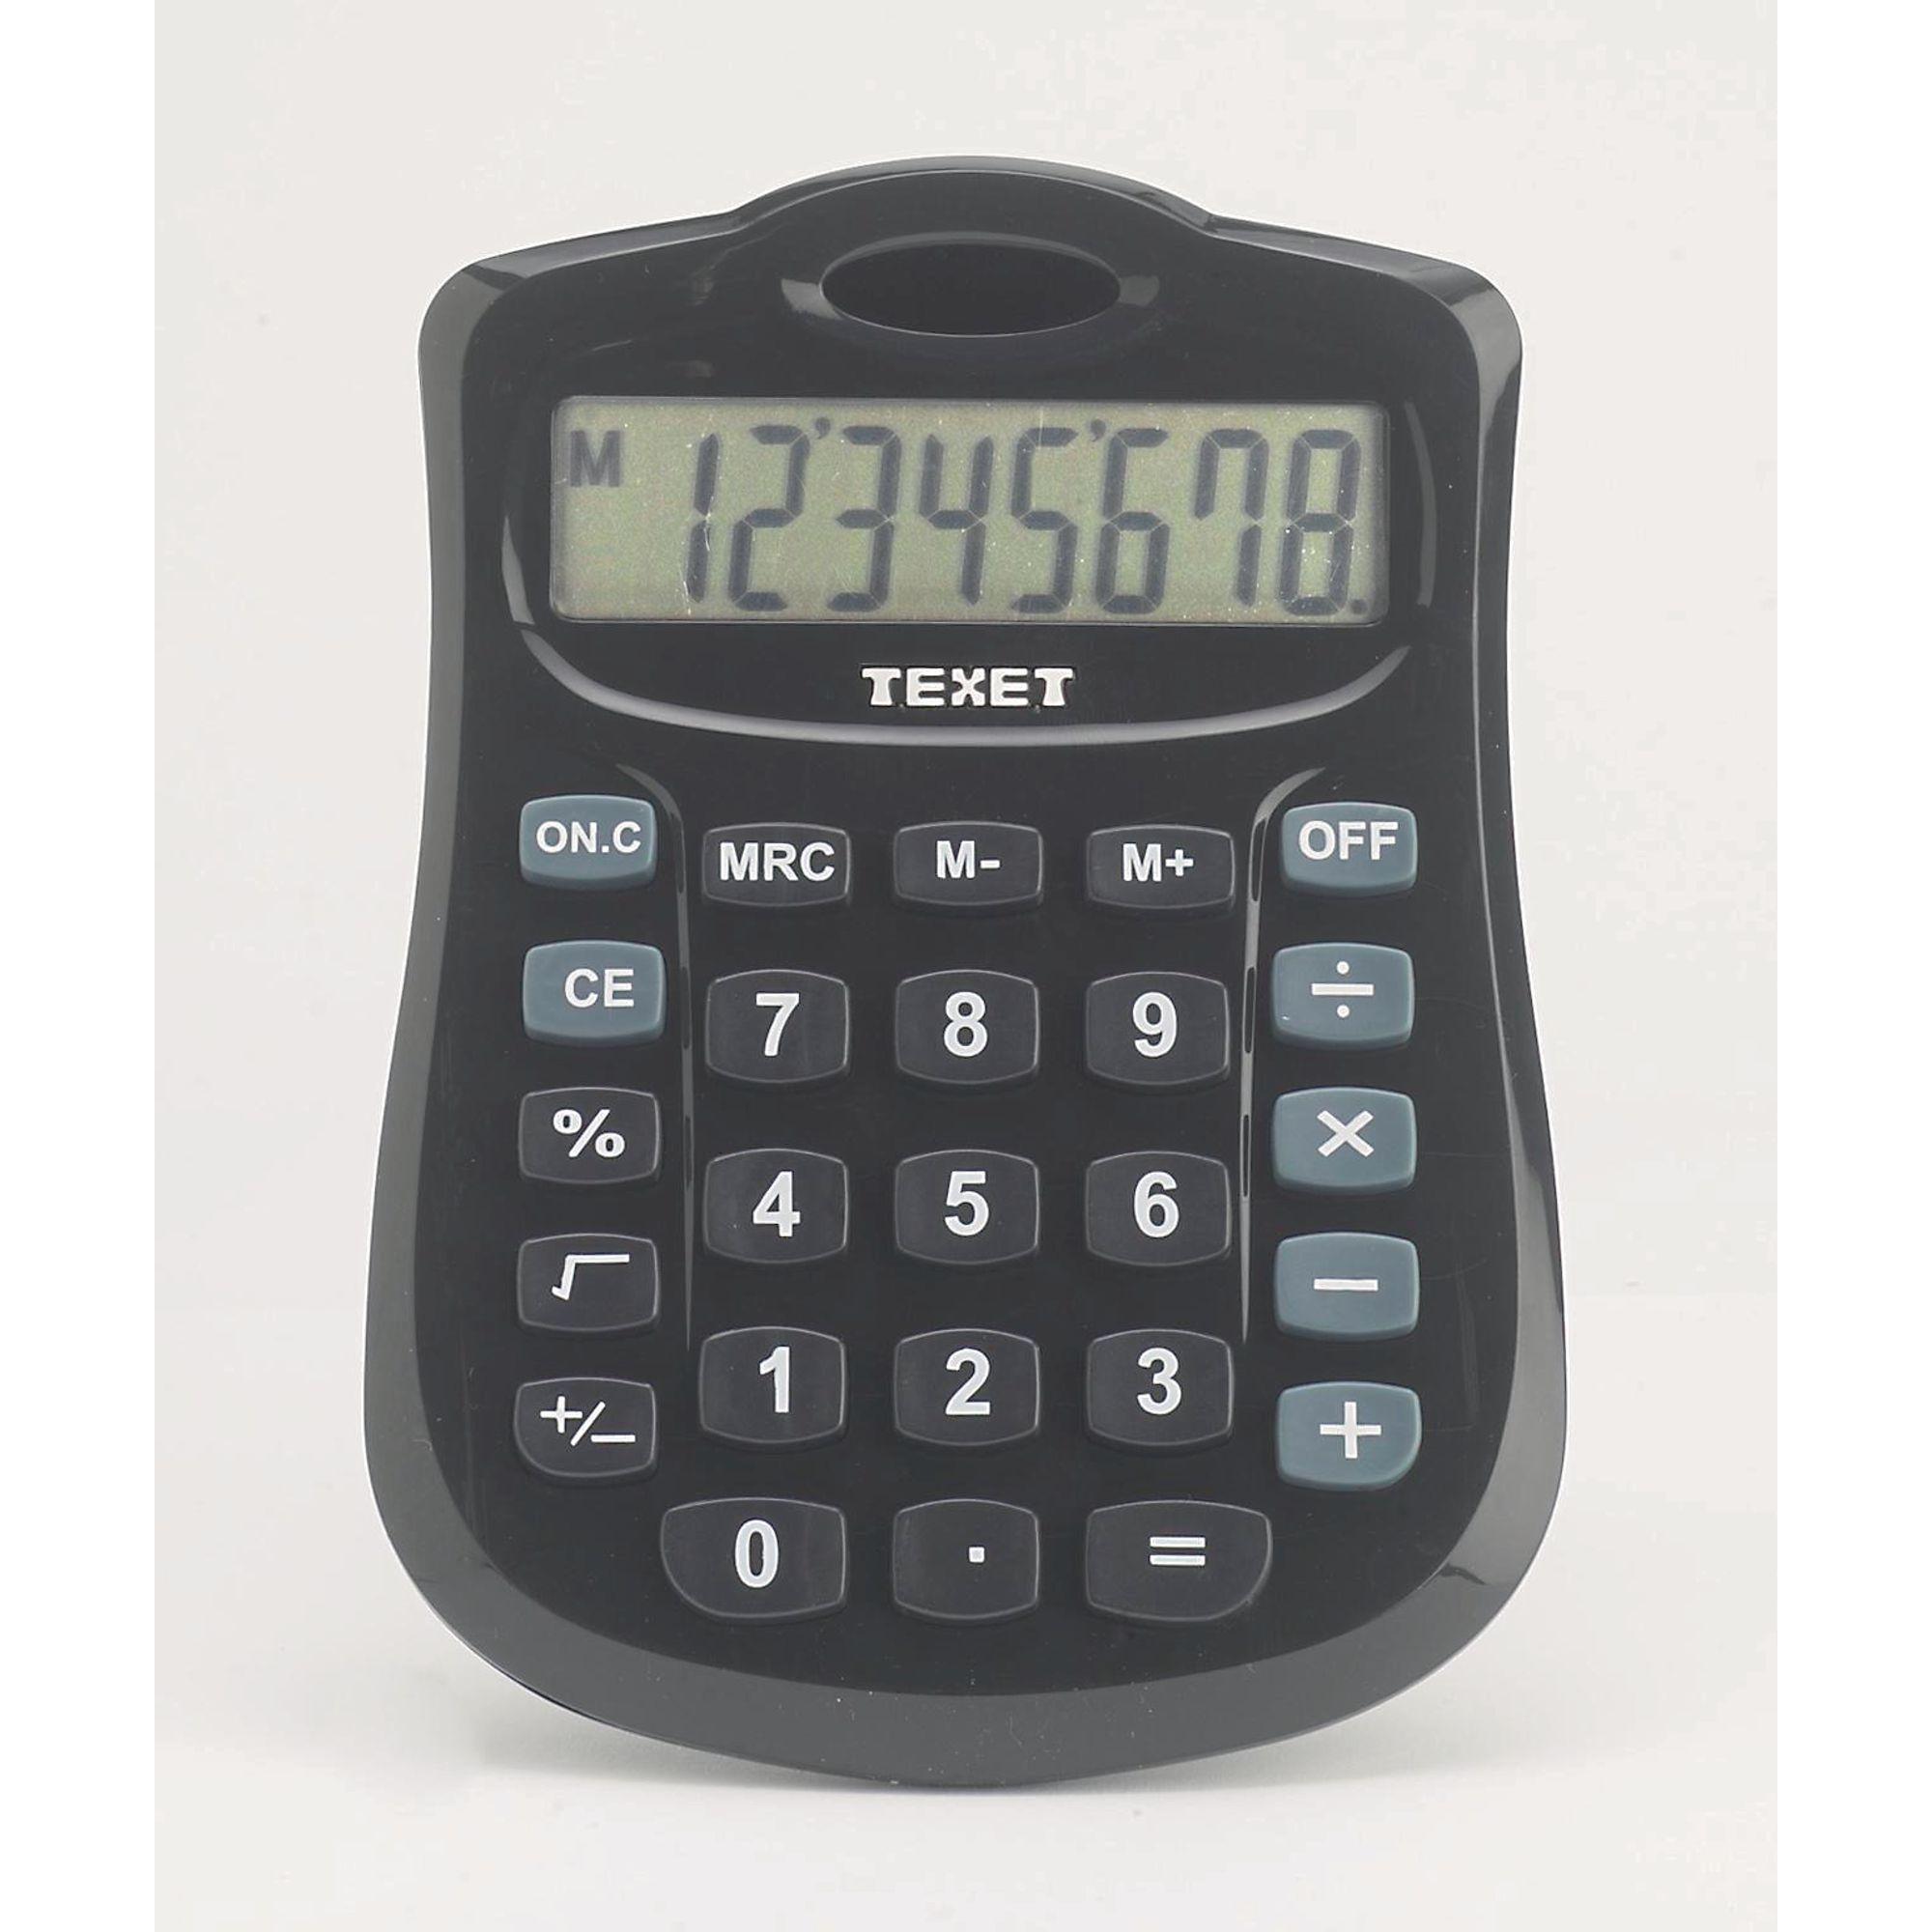 Texet Dv-8 Calculator